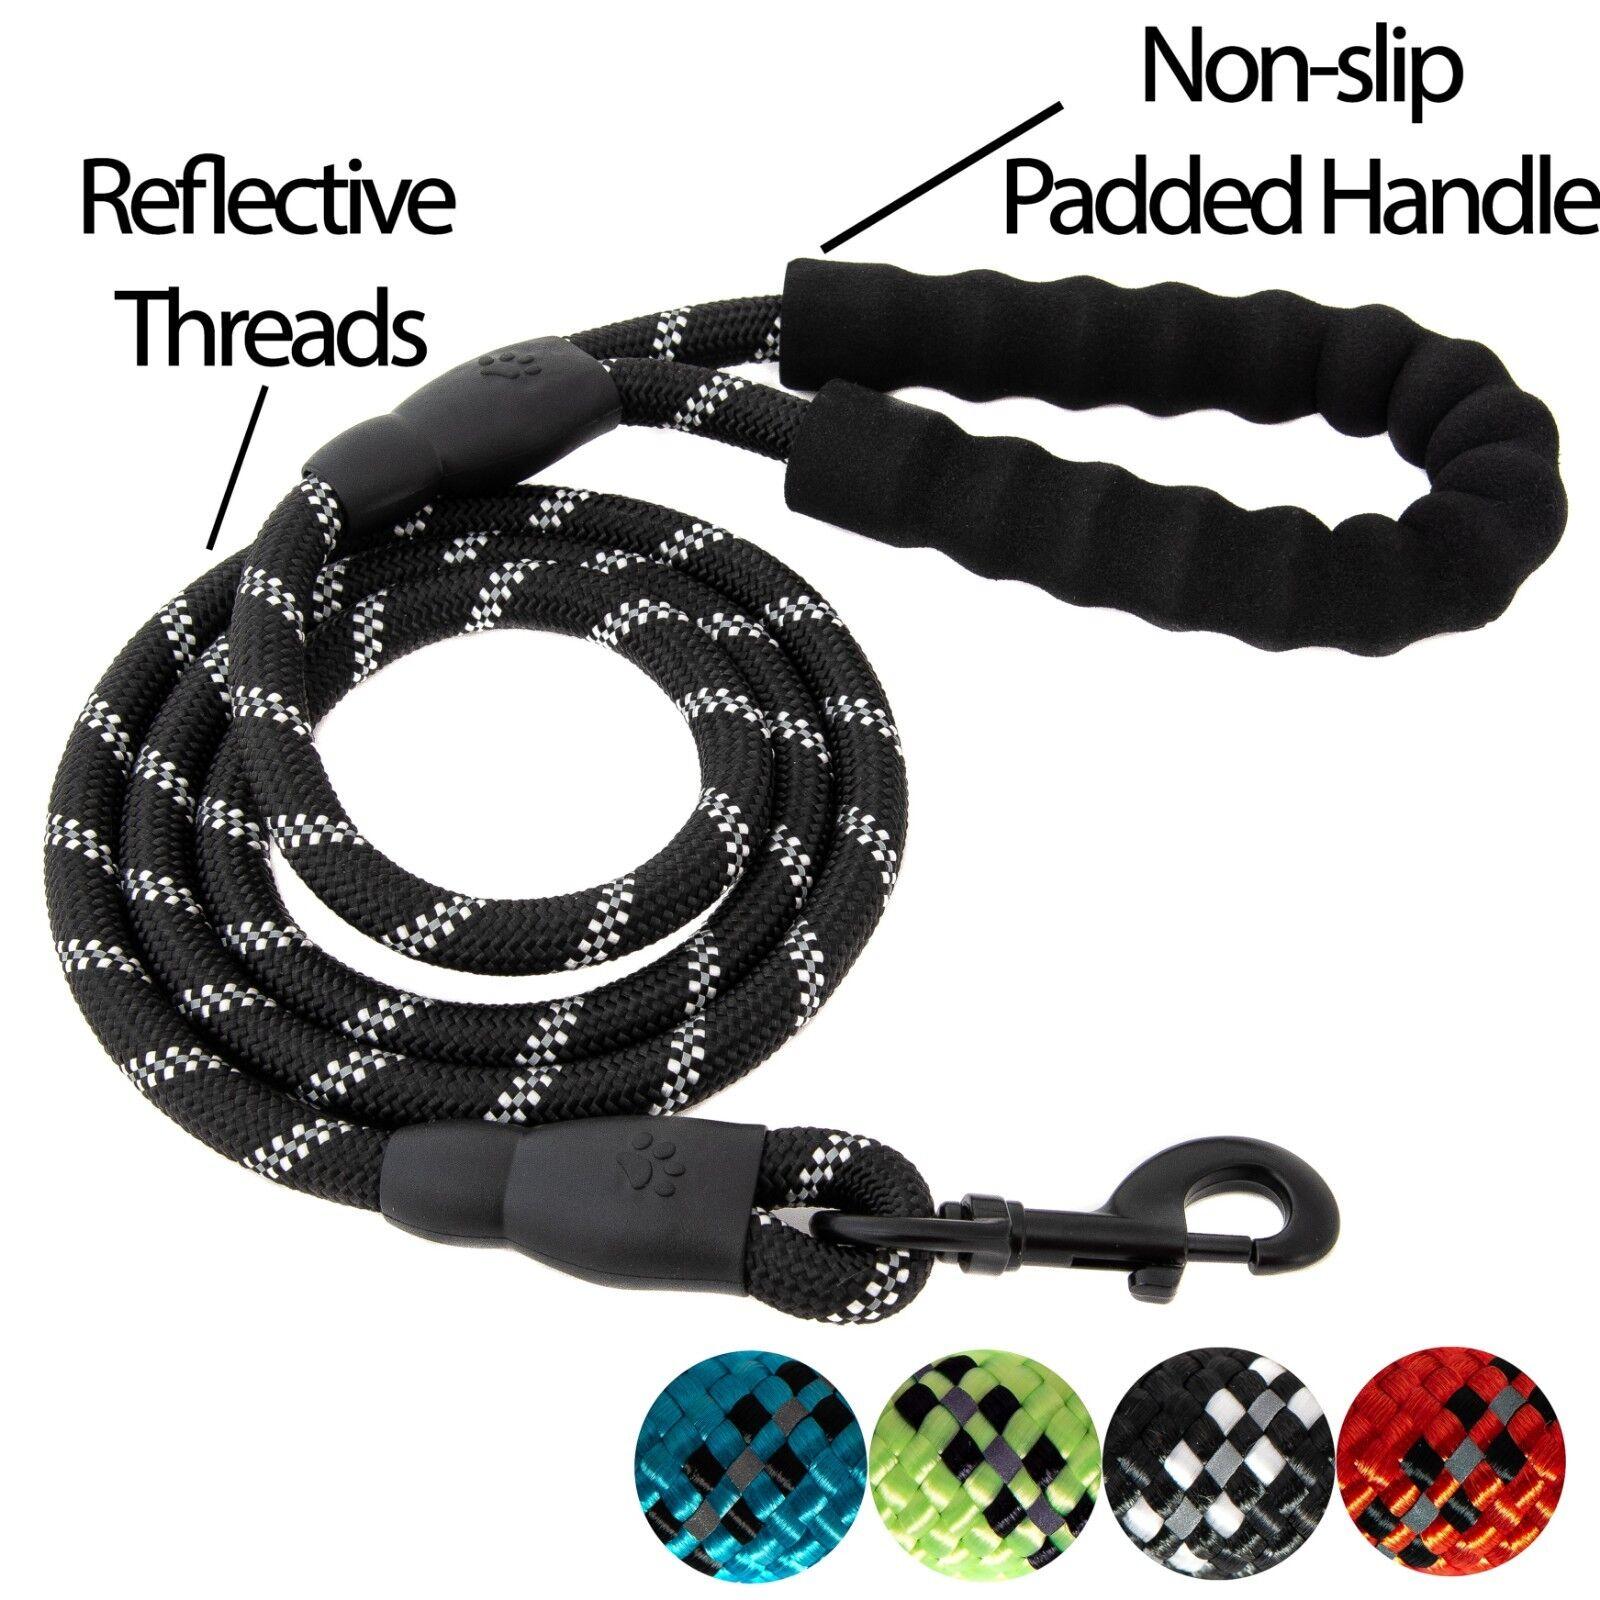 5 FT Service Dog Rope Leash Lead Training Padded Handle Refl